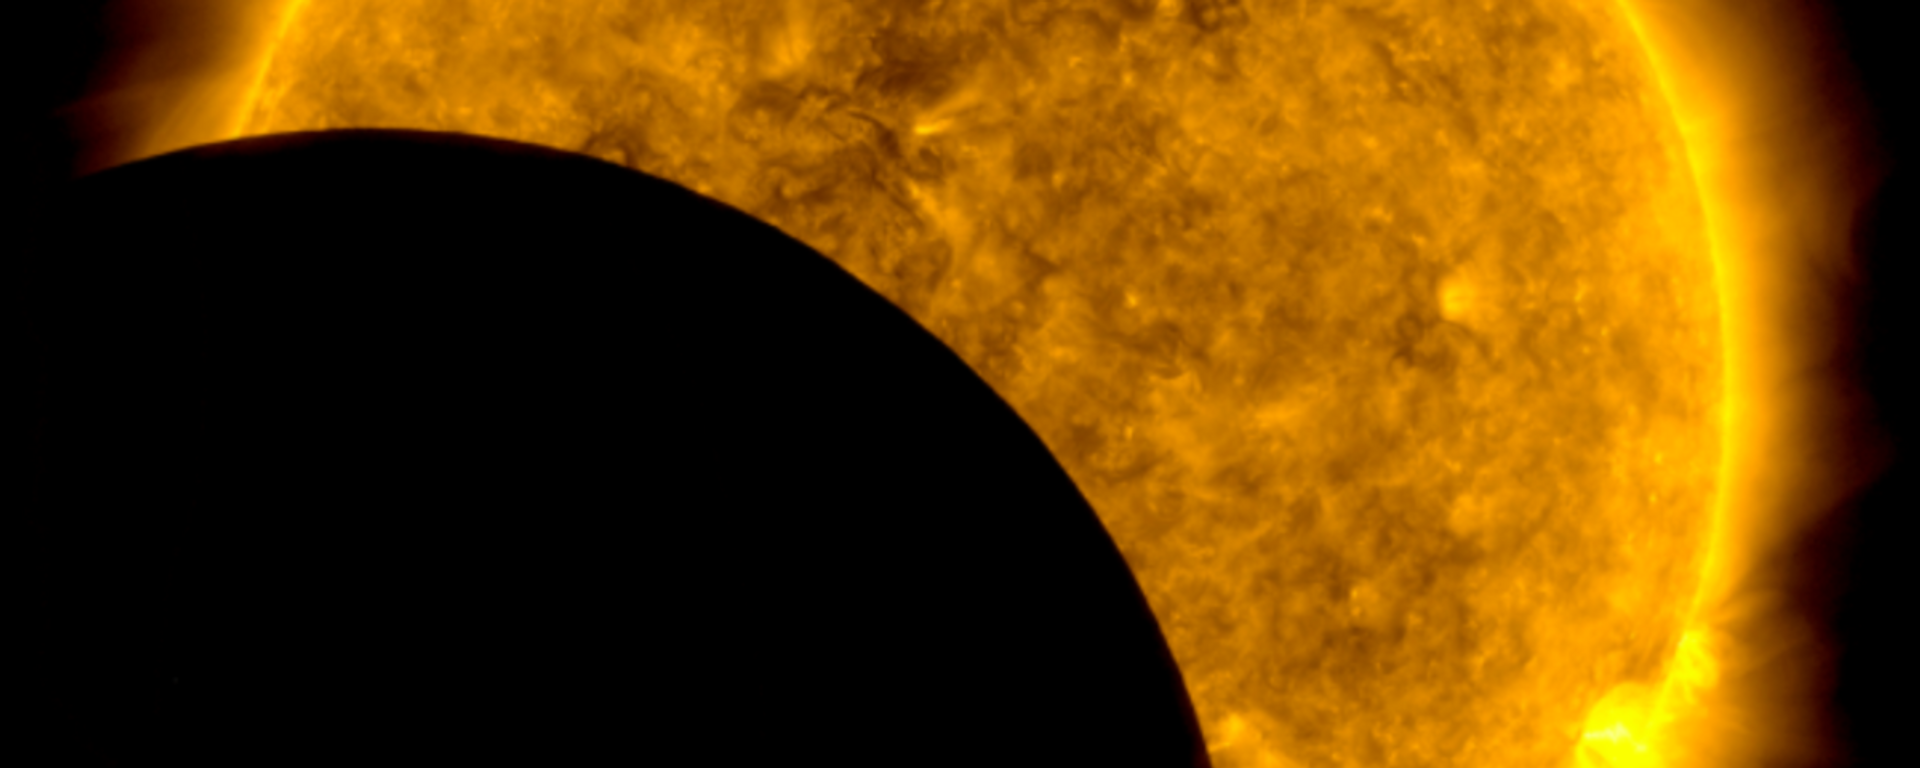 Sole e Luna - Sputnik Italia, 1920, 02.09.2021